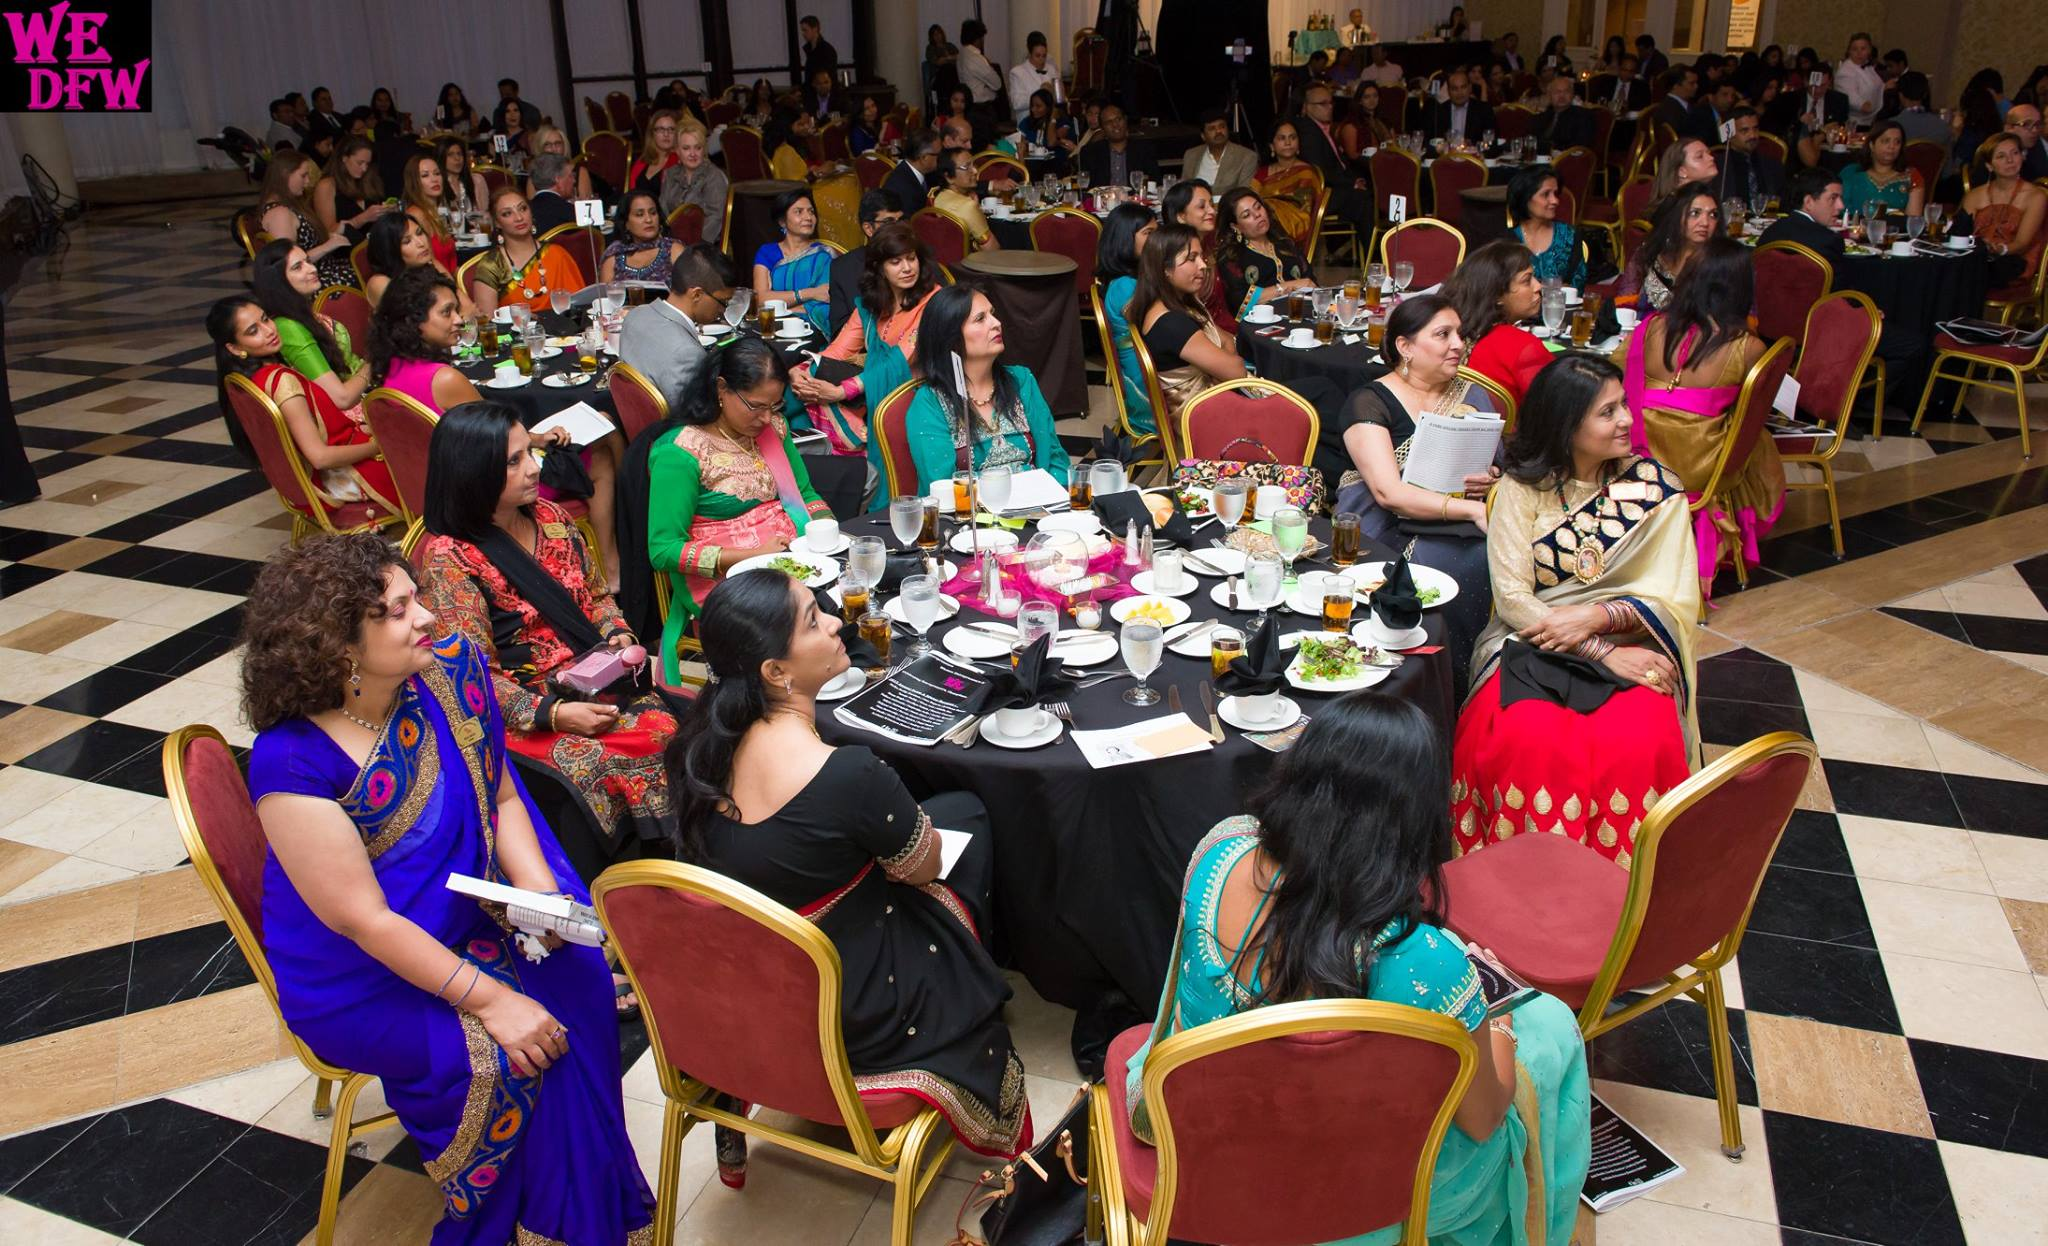 Sep 2015: Dinner Banquet - Member presentations